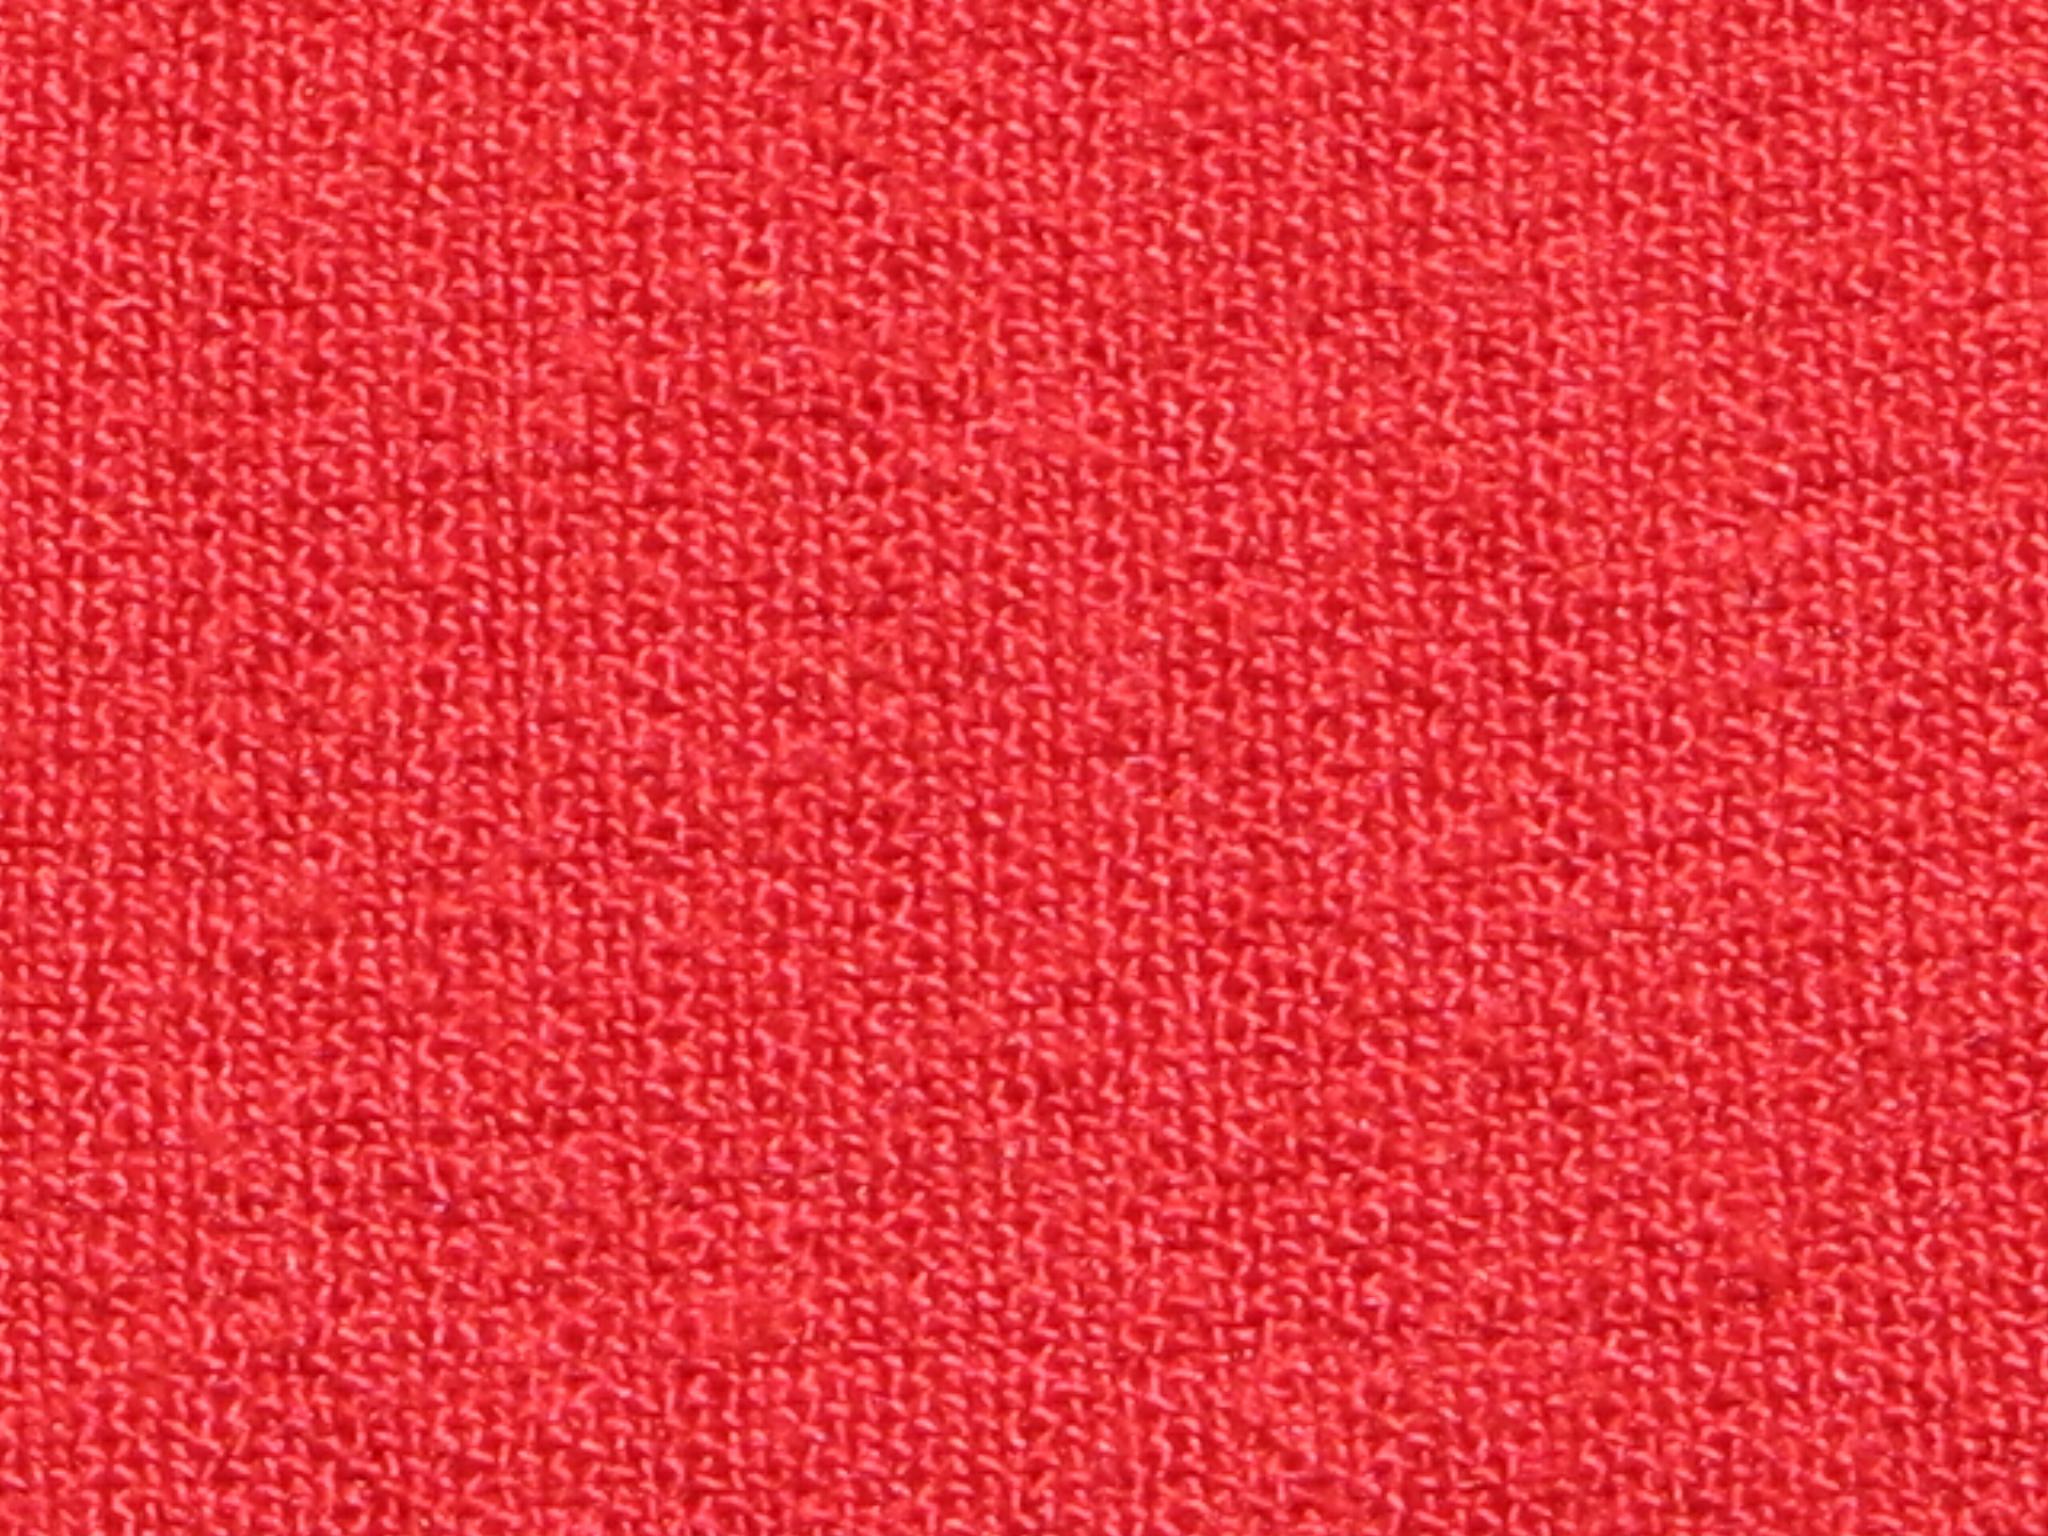 Paint Tool Sai Felt Fabric Texture